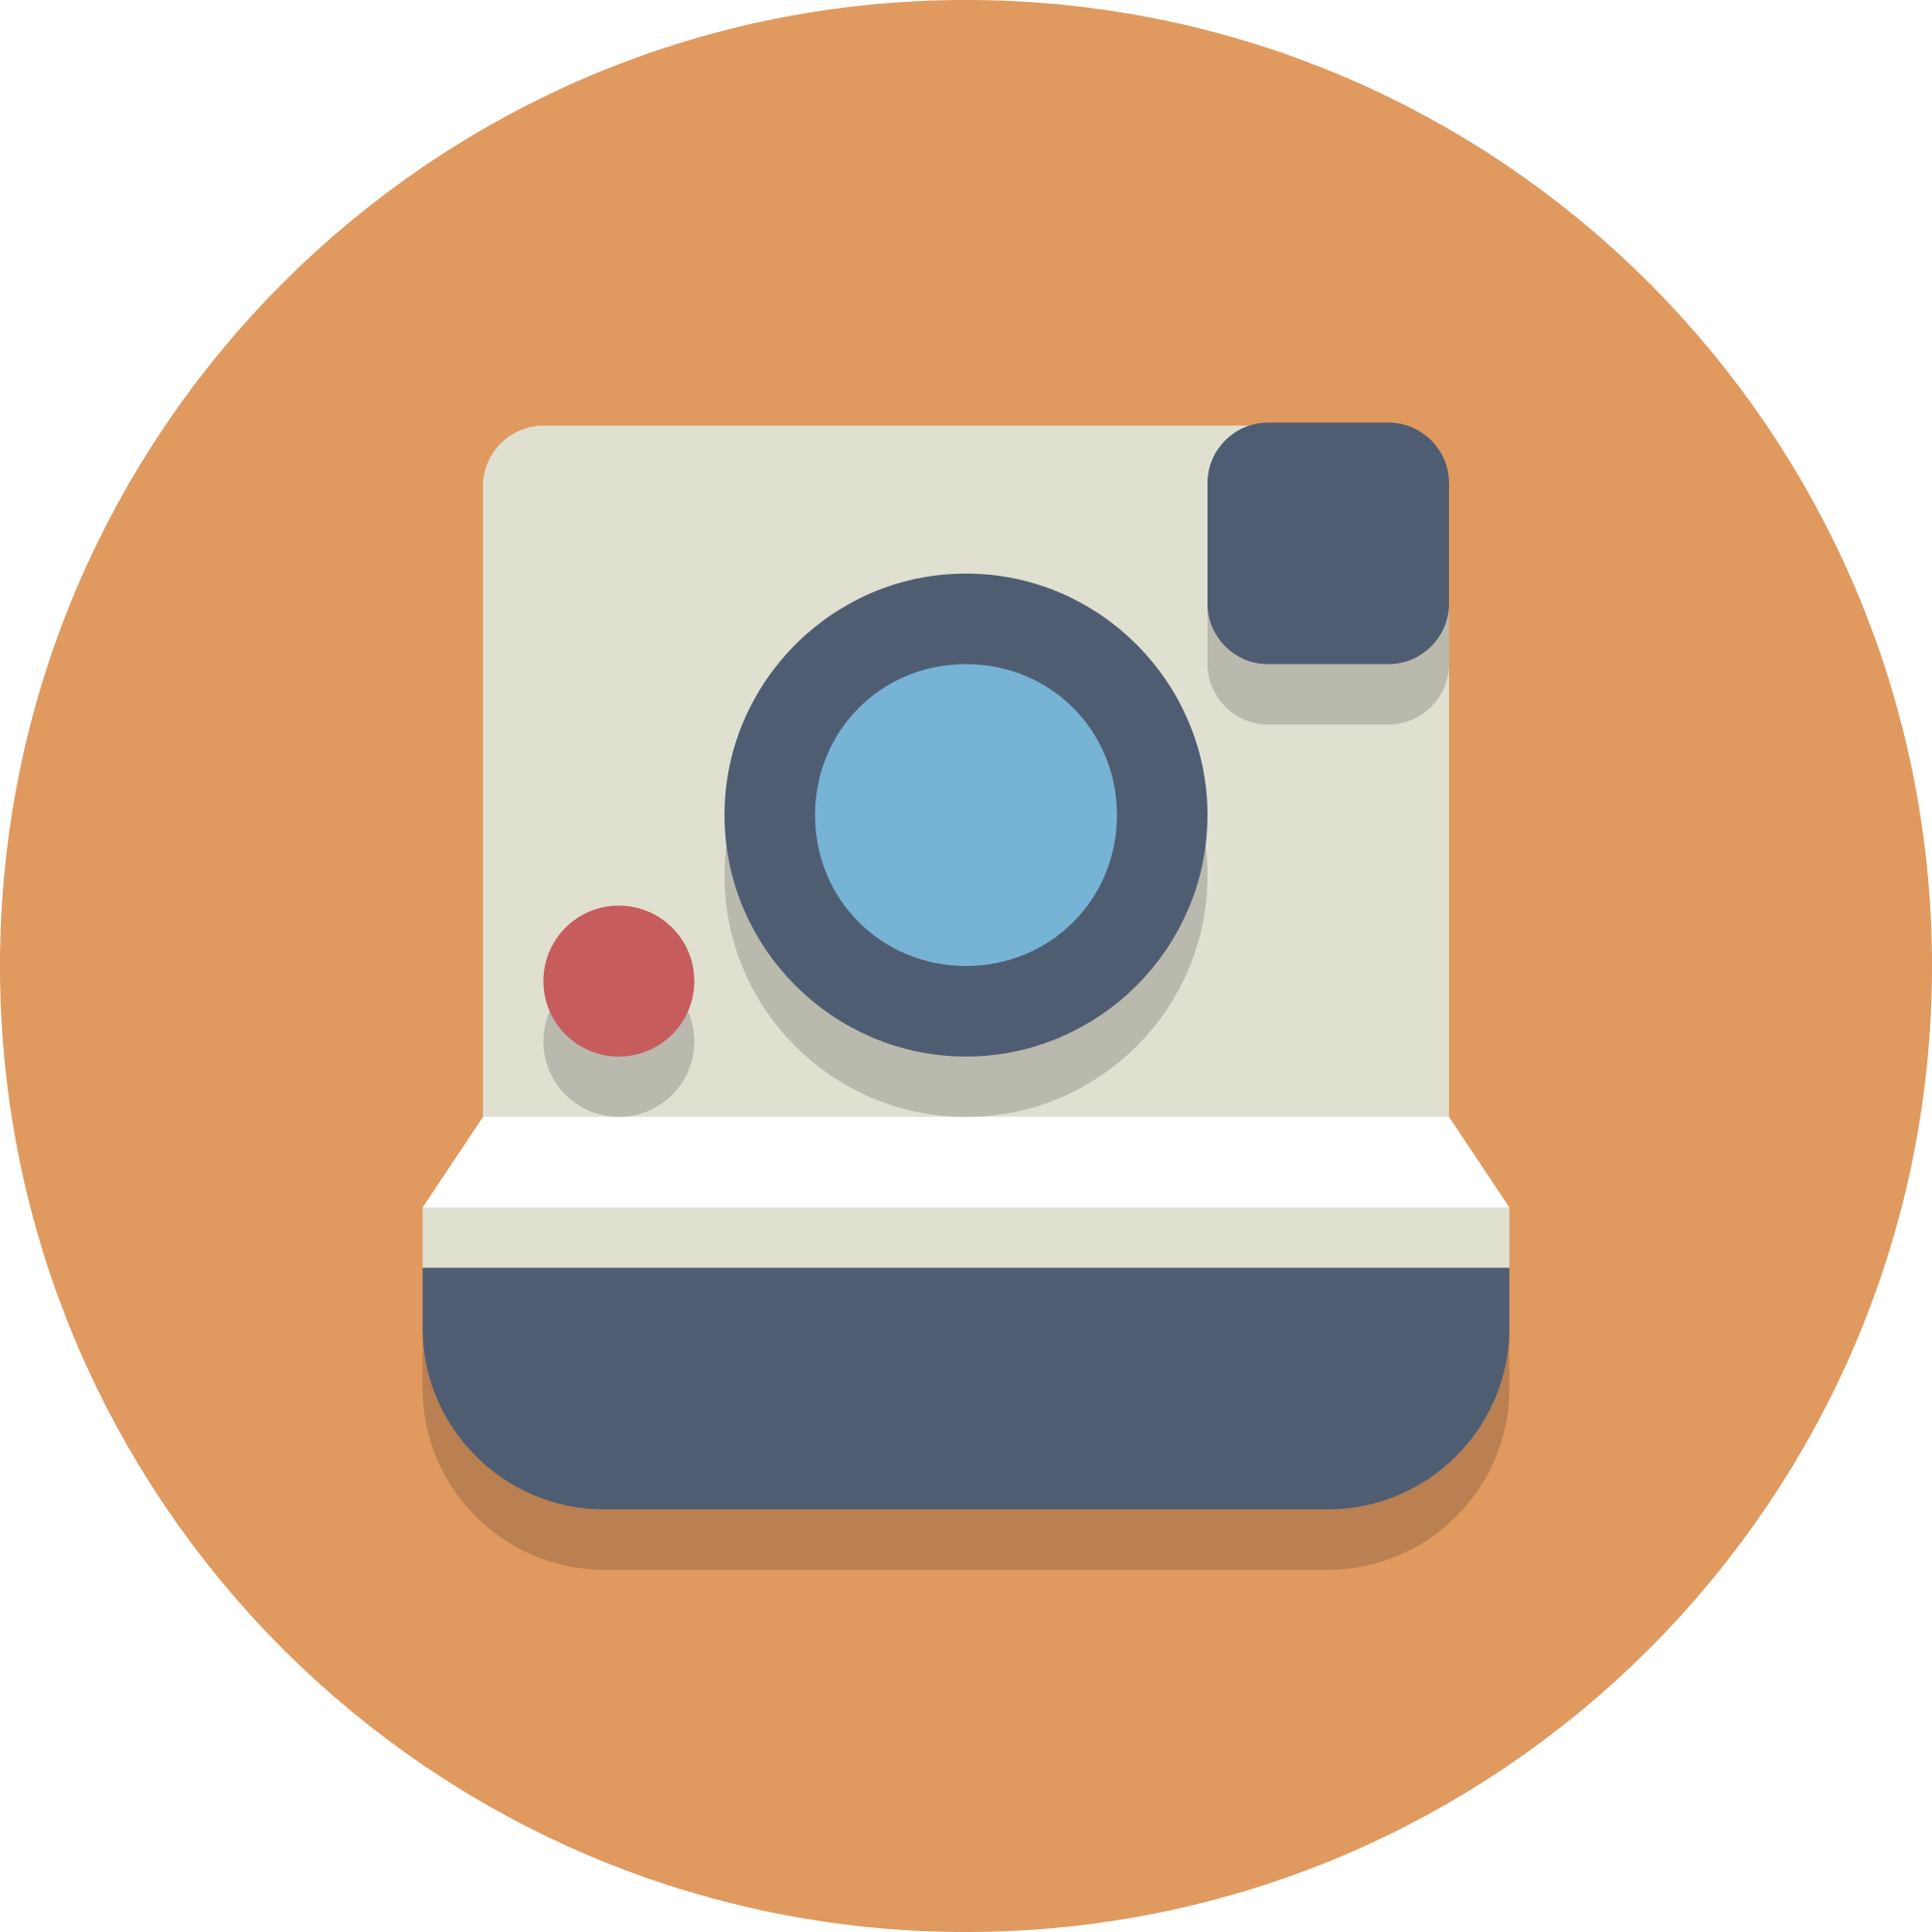 File circle icons polaroidcamera. Clipart camera polaroid camera